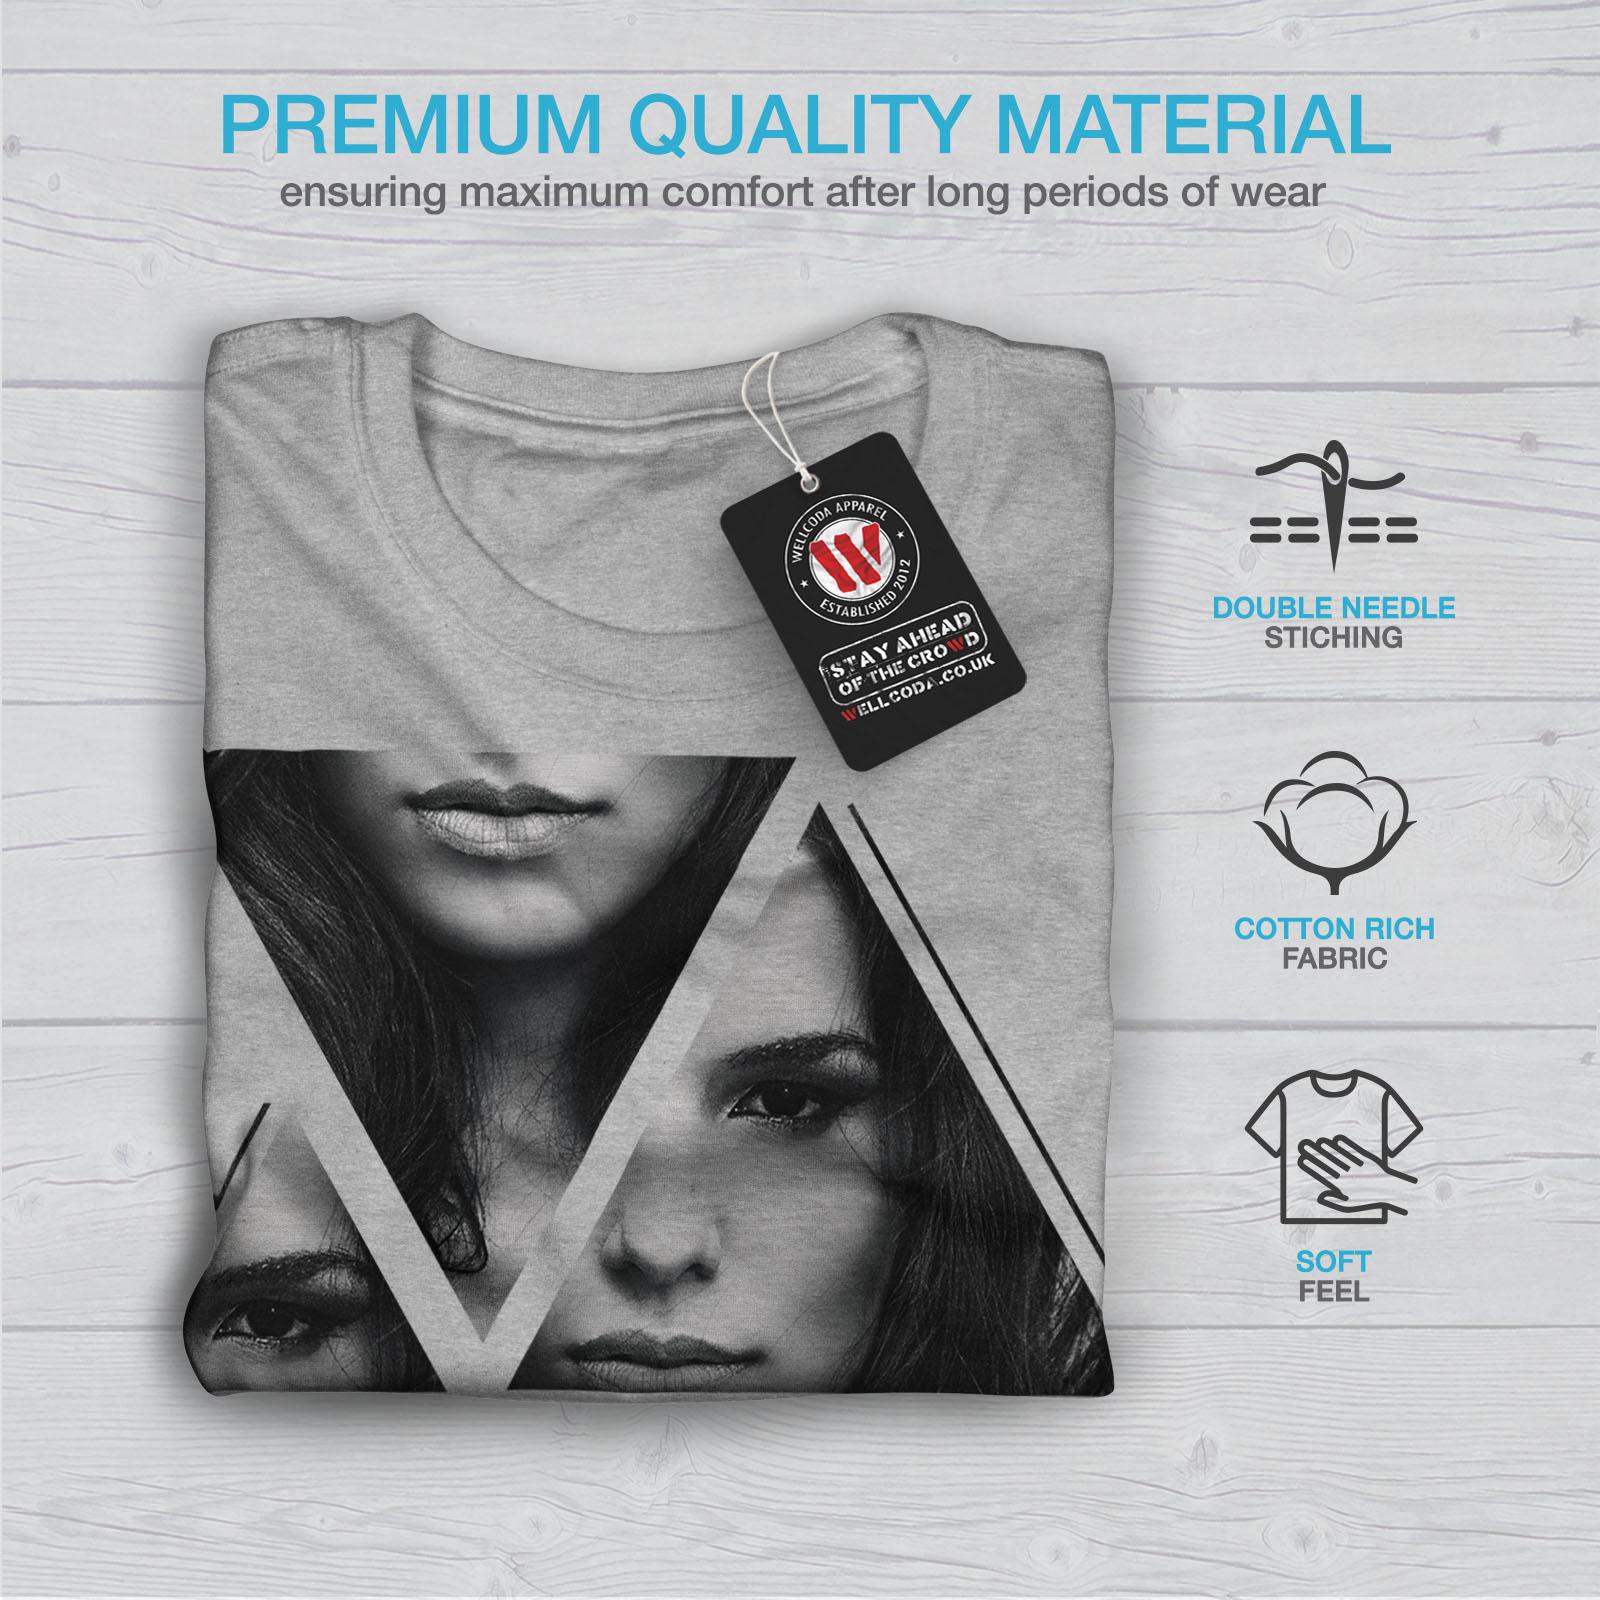 Wellcoda-Art-Fashion-Face-T-shirt-homme-Abstract-Design-graphique-imprime-Tee miniature 19